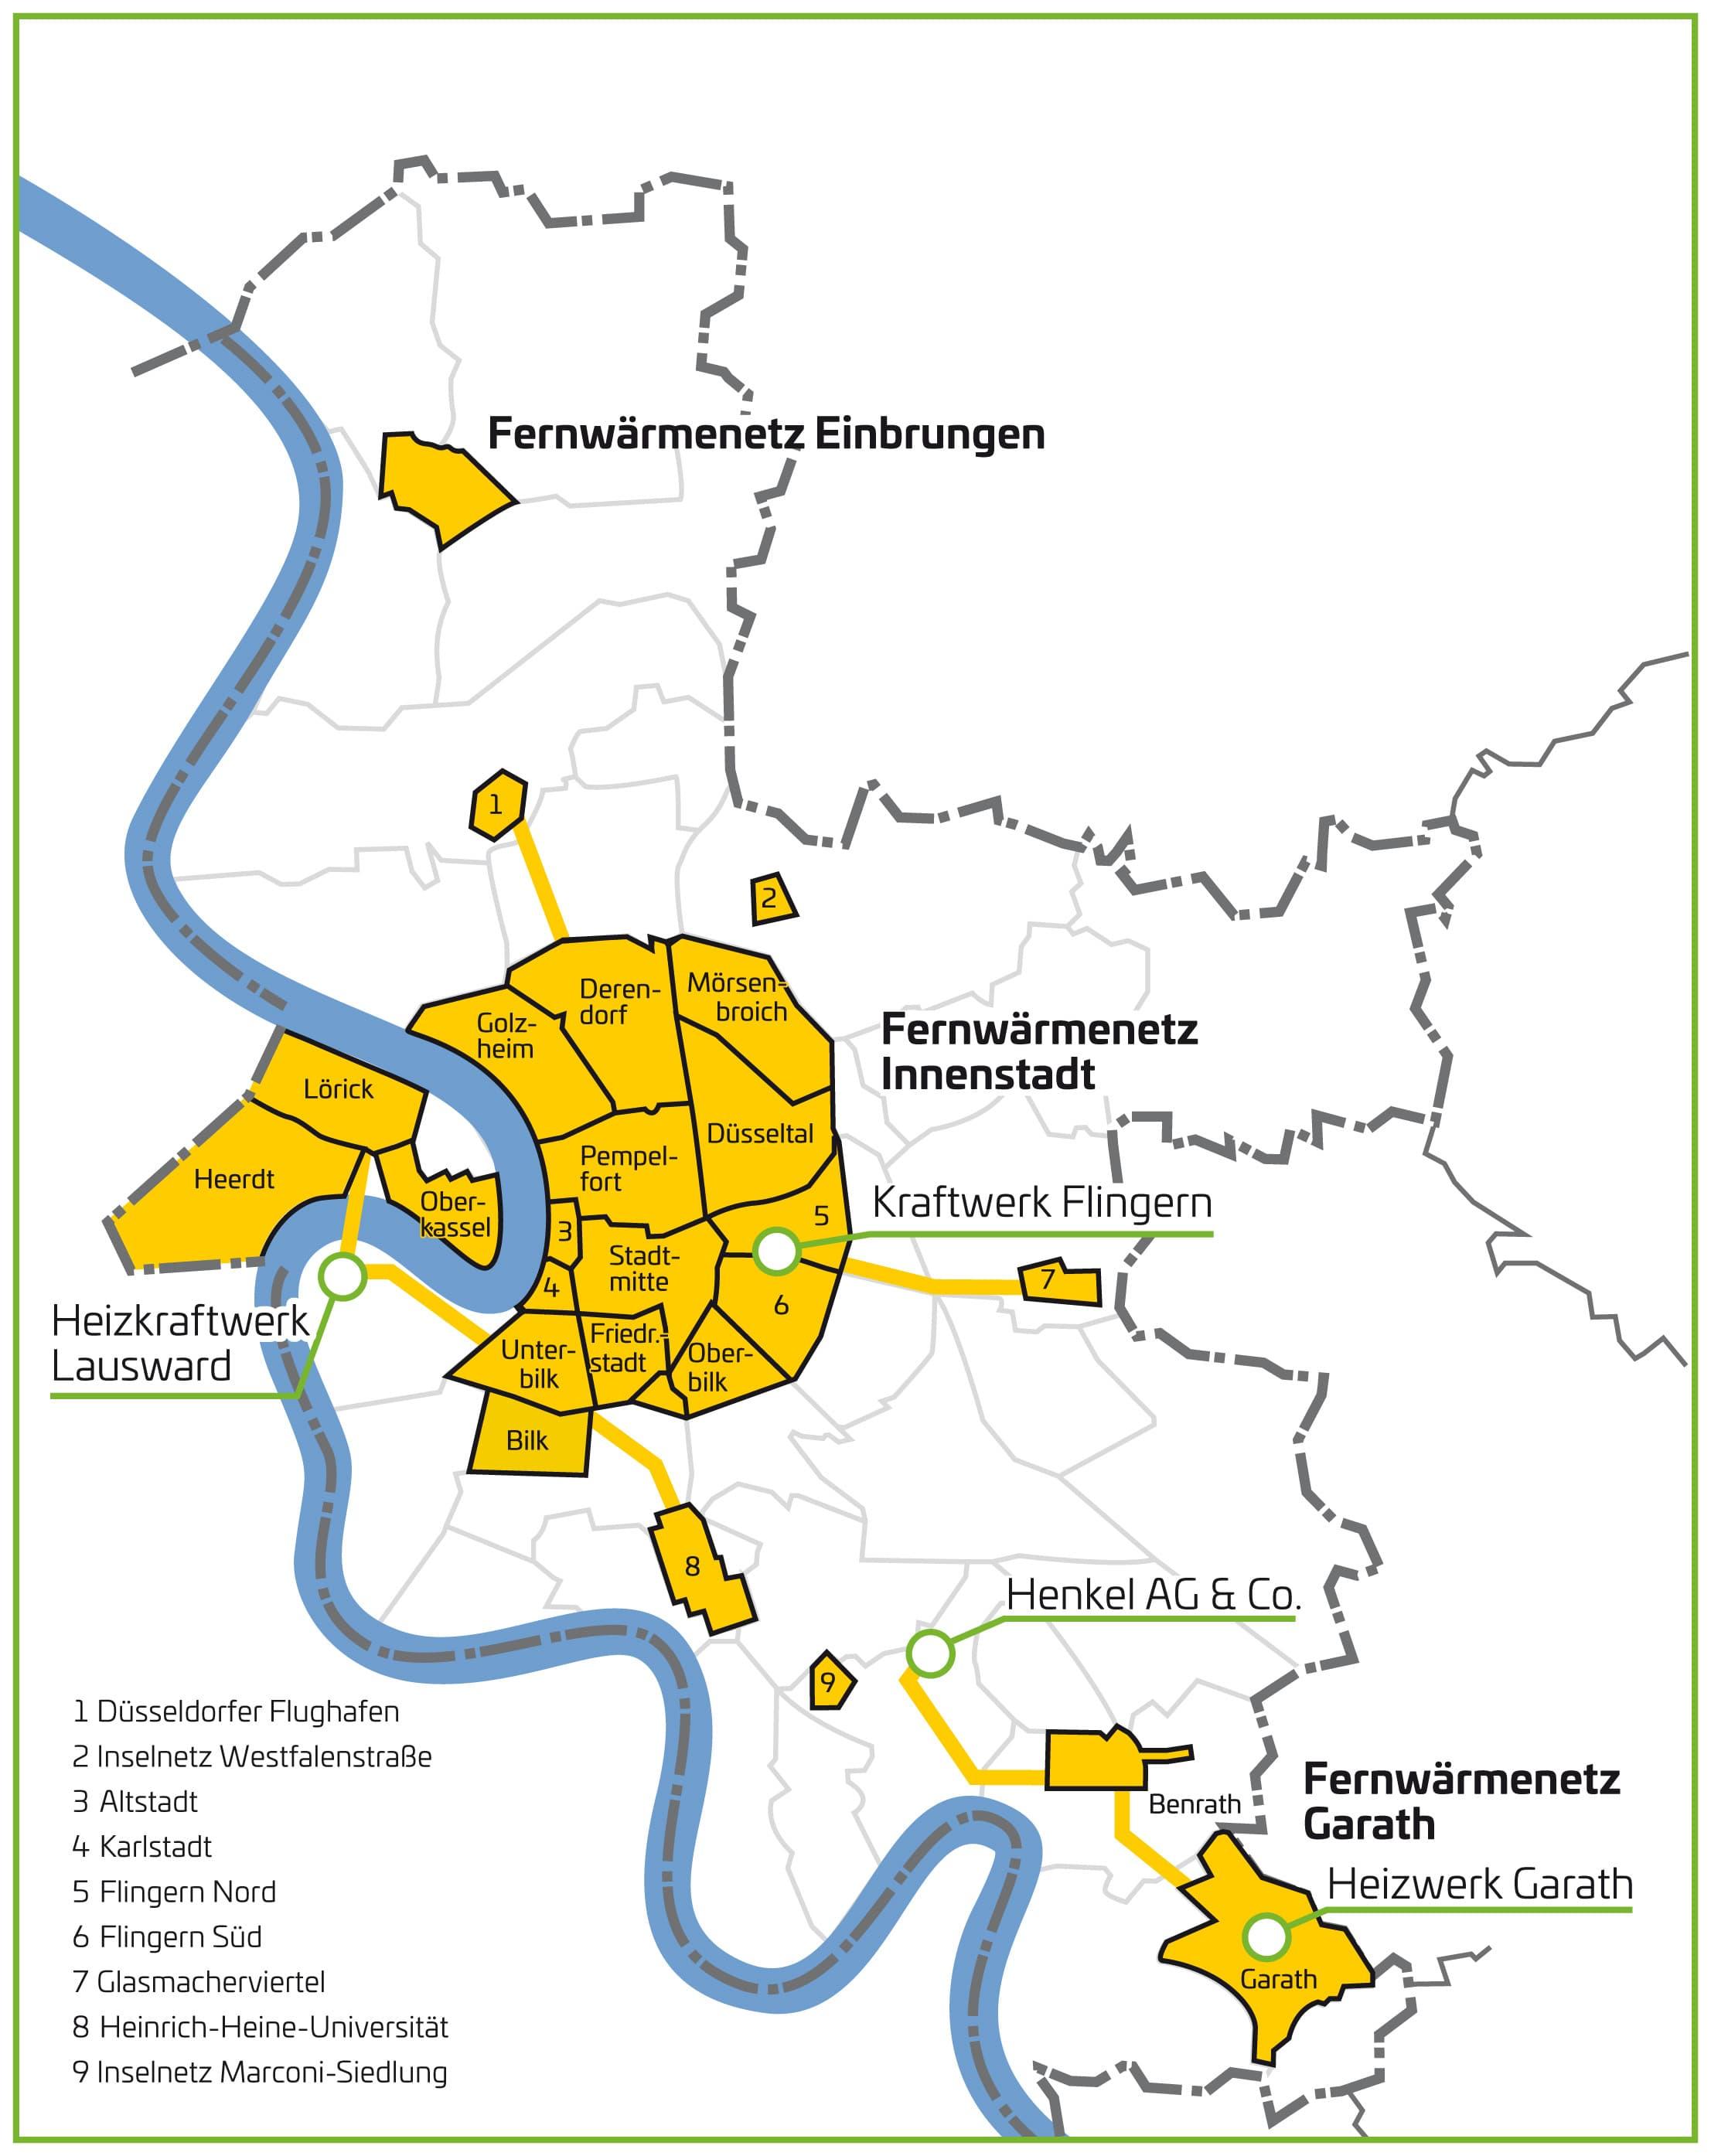 Düsseldorf Stadtteile Karte.Fernwärme In Düsseldorf Stadtwerke Düsseldorf